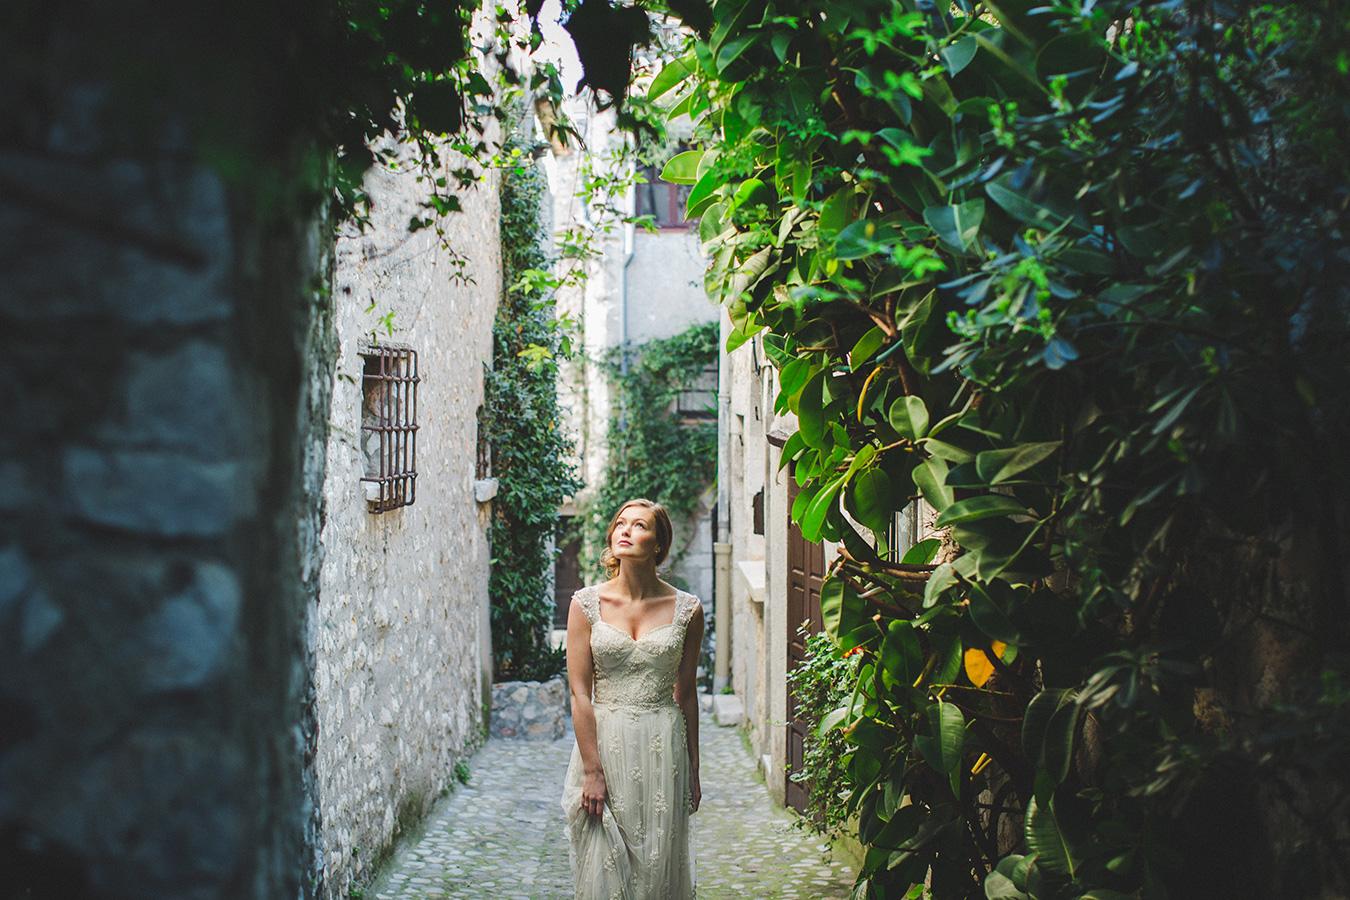 018-fotograf-tone-tvedt-bryllup-i-utlandet.jpg